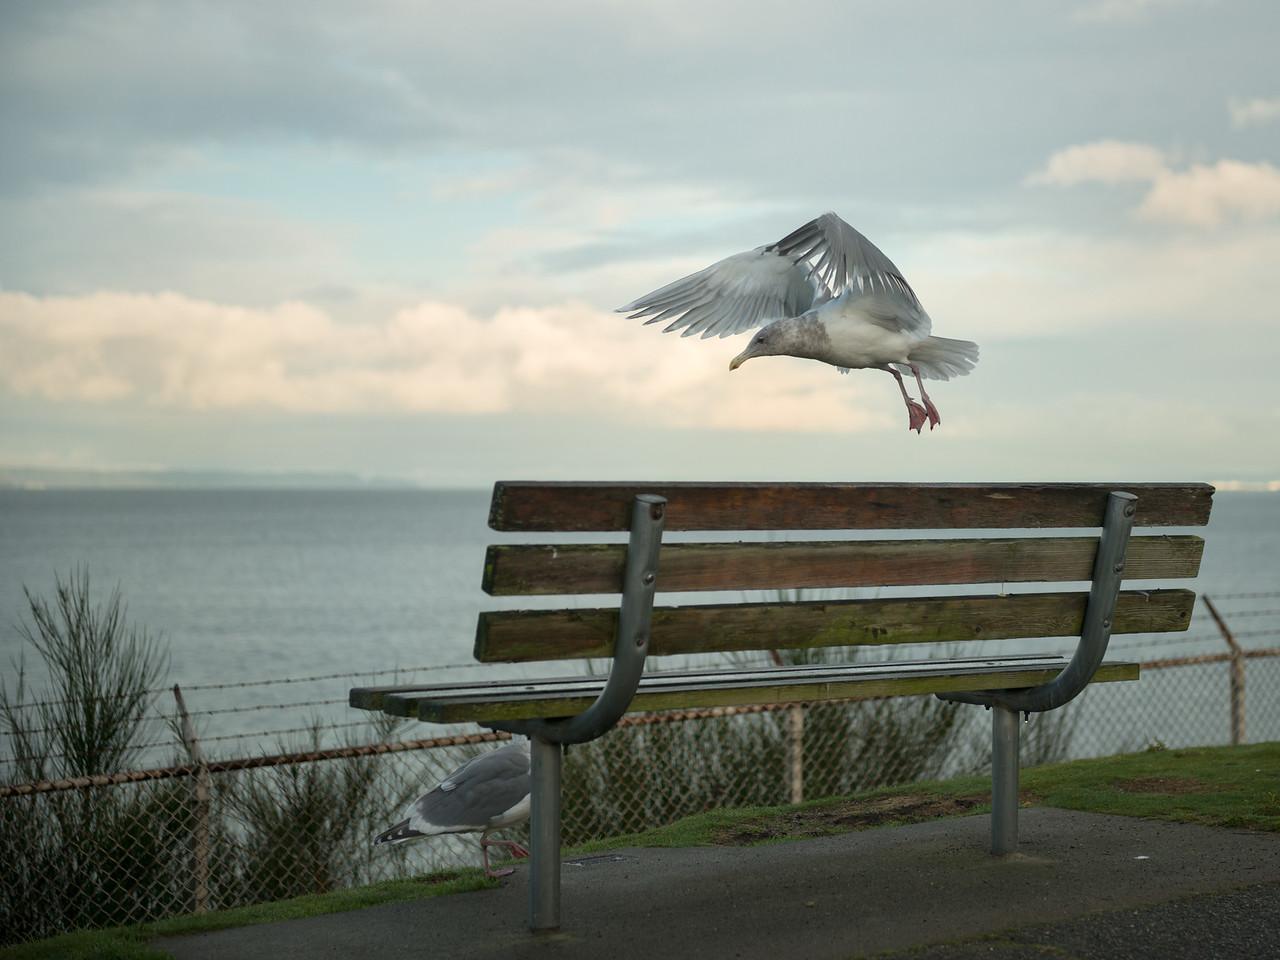 20151222.  Seagulls on a park bench, Carkeek Park, Seattle WA.